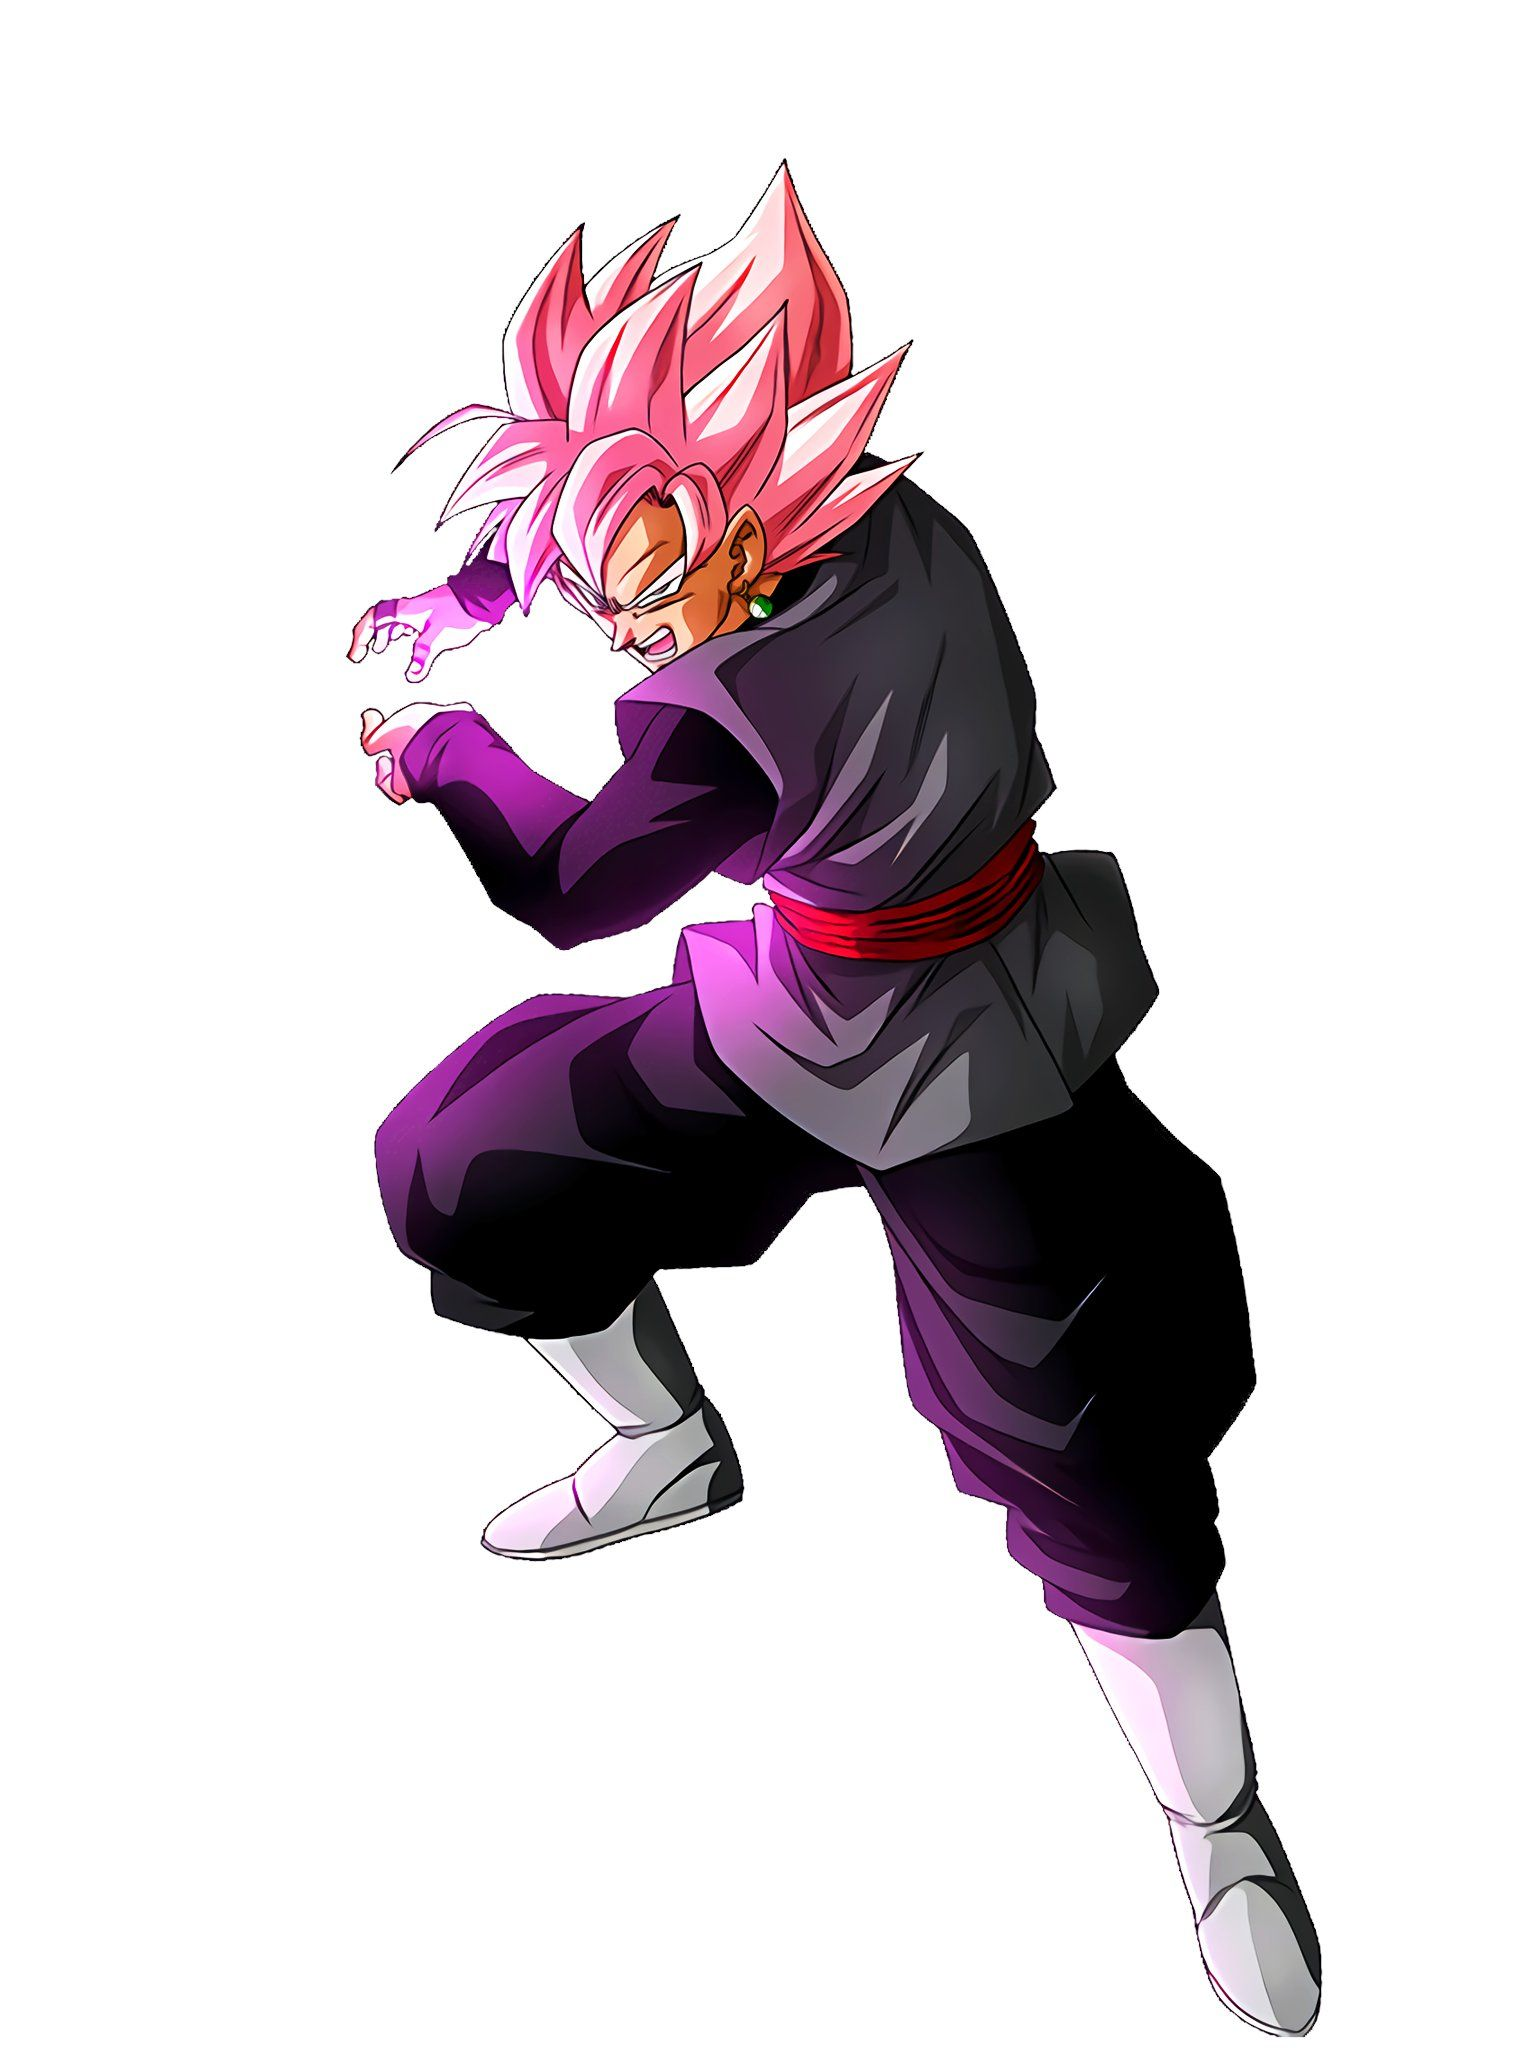 Hydros On Twitter Anime Dragon Ball Super Super Saiyan Rose Goku Black Super Saiyan